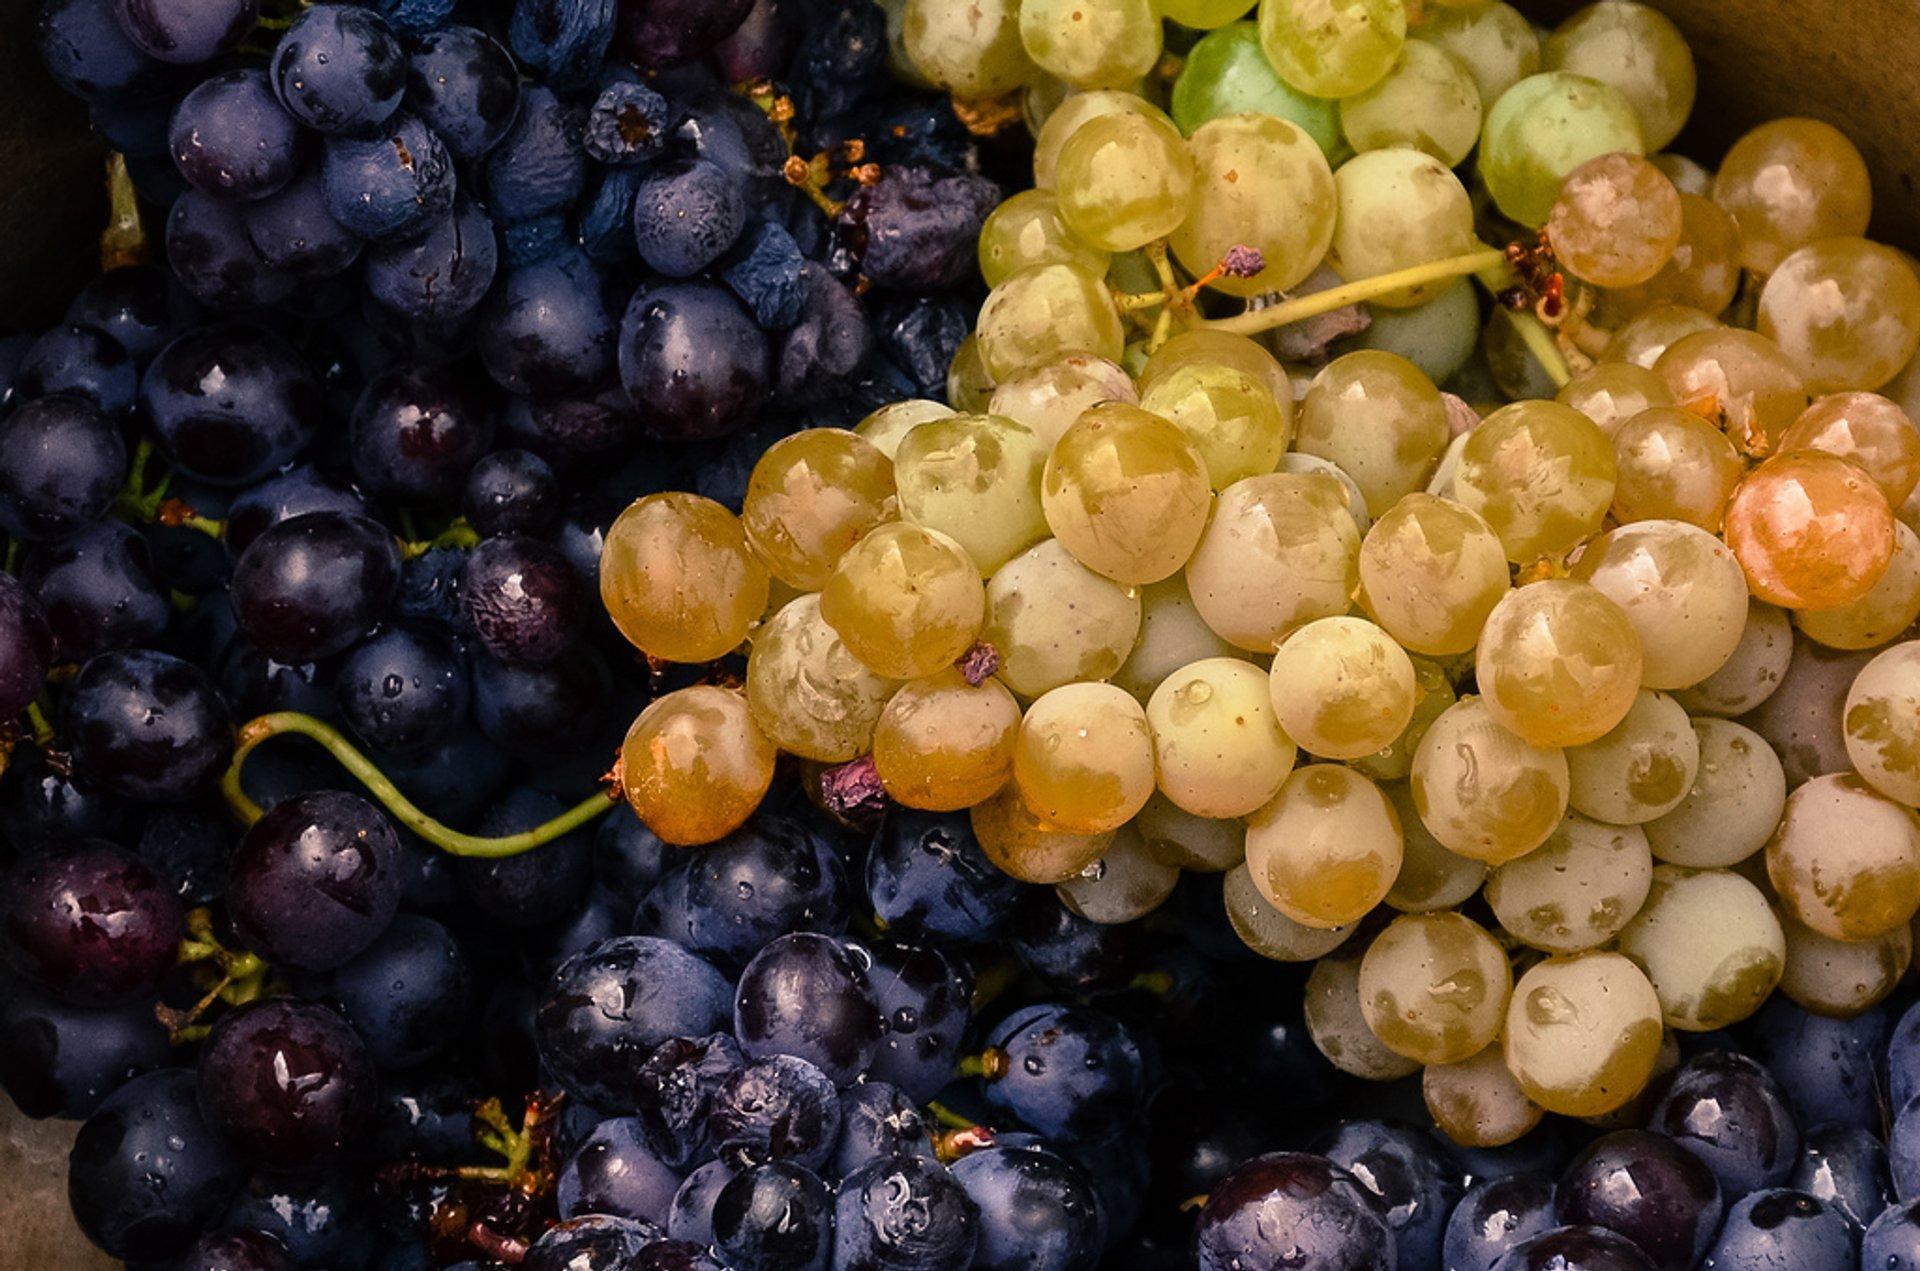 Grape Harvest in Cappadocia 2020 - Best Time